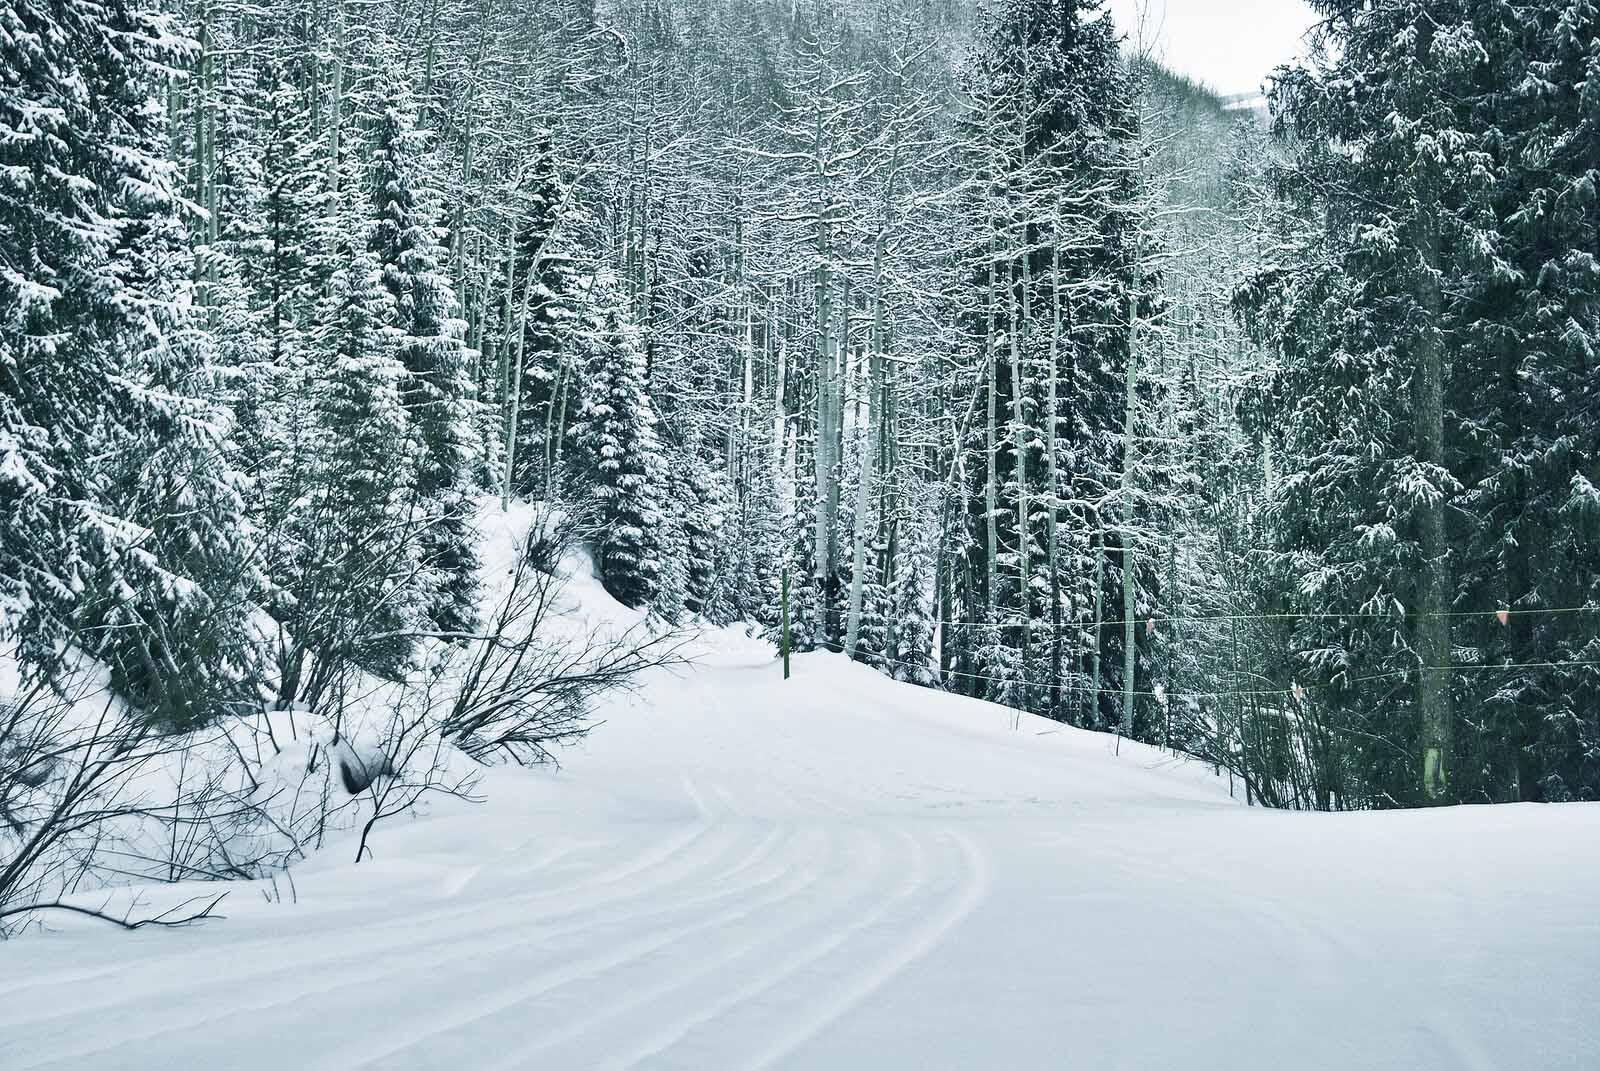 Colorado Rocky Mountain Winter Vacation Activities & Planning